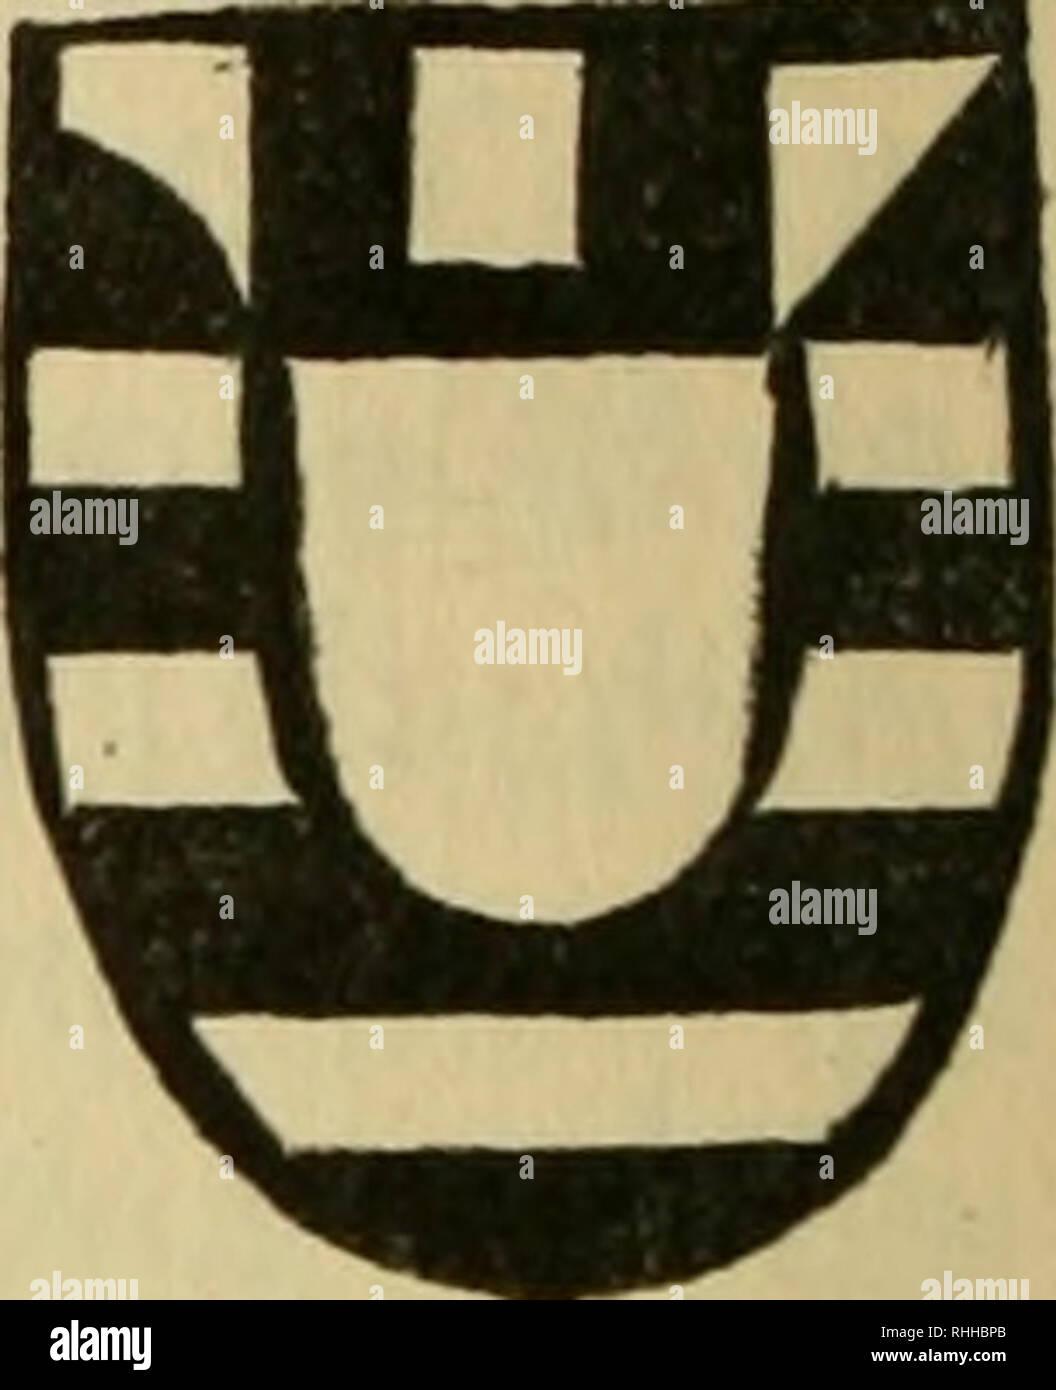 ". The boke of Saint Albans. Horses; Falconry; Hunting; Heraldry; Incunabula. CT. jSF)e Ifici^ quatcip q^oIbUs and ^o(q tStd; a bt^ix mucb datlg ii 19 op^ id)aini|^0 m ot?» fpnic of t^iU of ()?lat<l^ K^6 fjguoe . Qlnt cetfon men fag g* men nof puttgnc^ a wetucUe^iffewiTie ef bUf)wg fog •. ii)at H^ fax fbgb <EiU of mawl)G tljz Ricbc Koc ©l^ p^oo^ct tgn w tf)g0 Kpfcfofap <[I^rpojfauitaimapola tabattfttaettJontcftconato »afono^ auto aim O^^^o fimpUafcufo XI axa^wva . ©aUia fic . <C3^P'*^P^^ ^""^ 5i(DTiCtoroj(S »i ctcon^cfcu fimpUjtJtojent . Qlnqttct fic . »f« mag b e:lb . ^oi if d} - Stock Image"